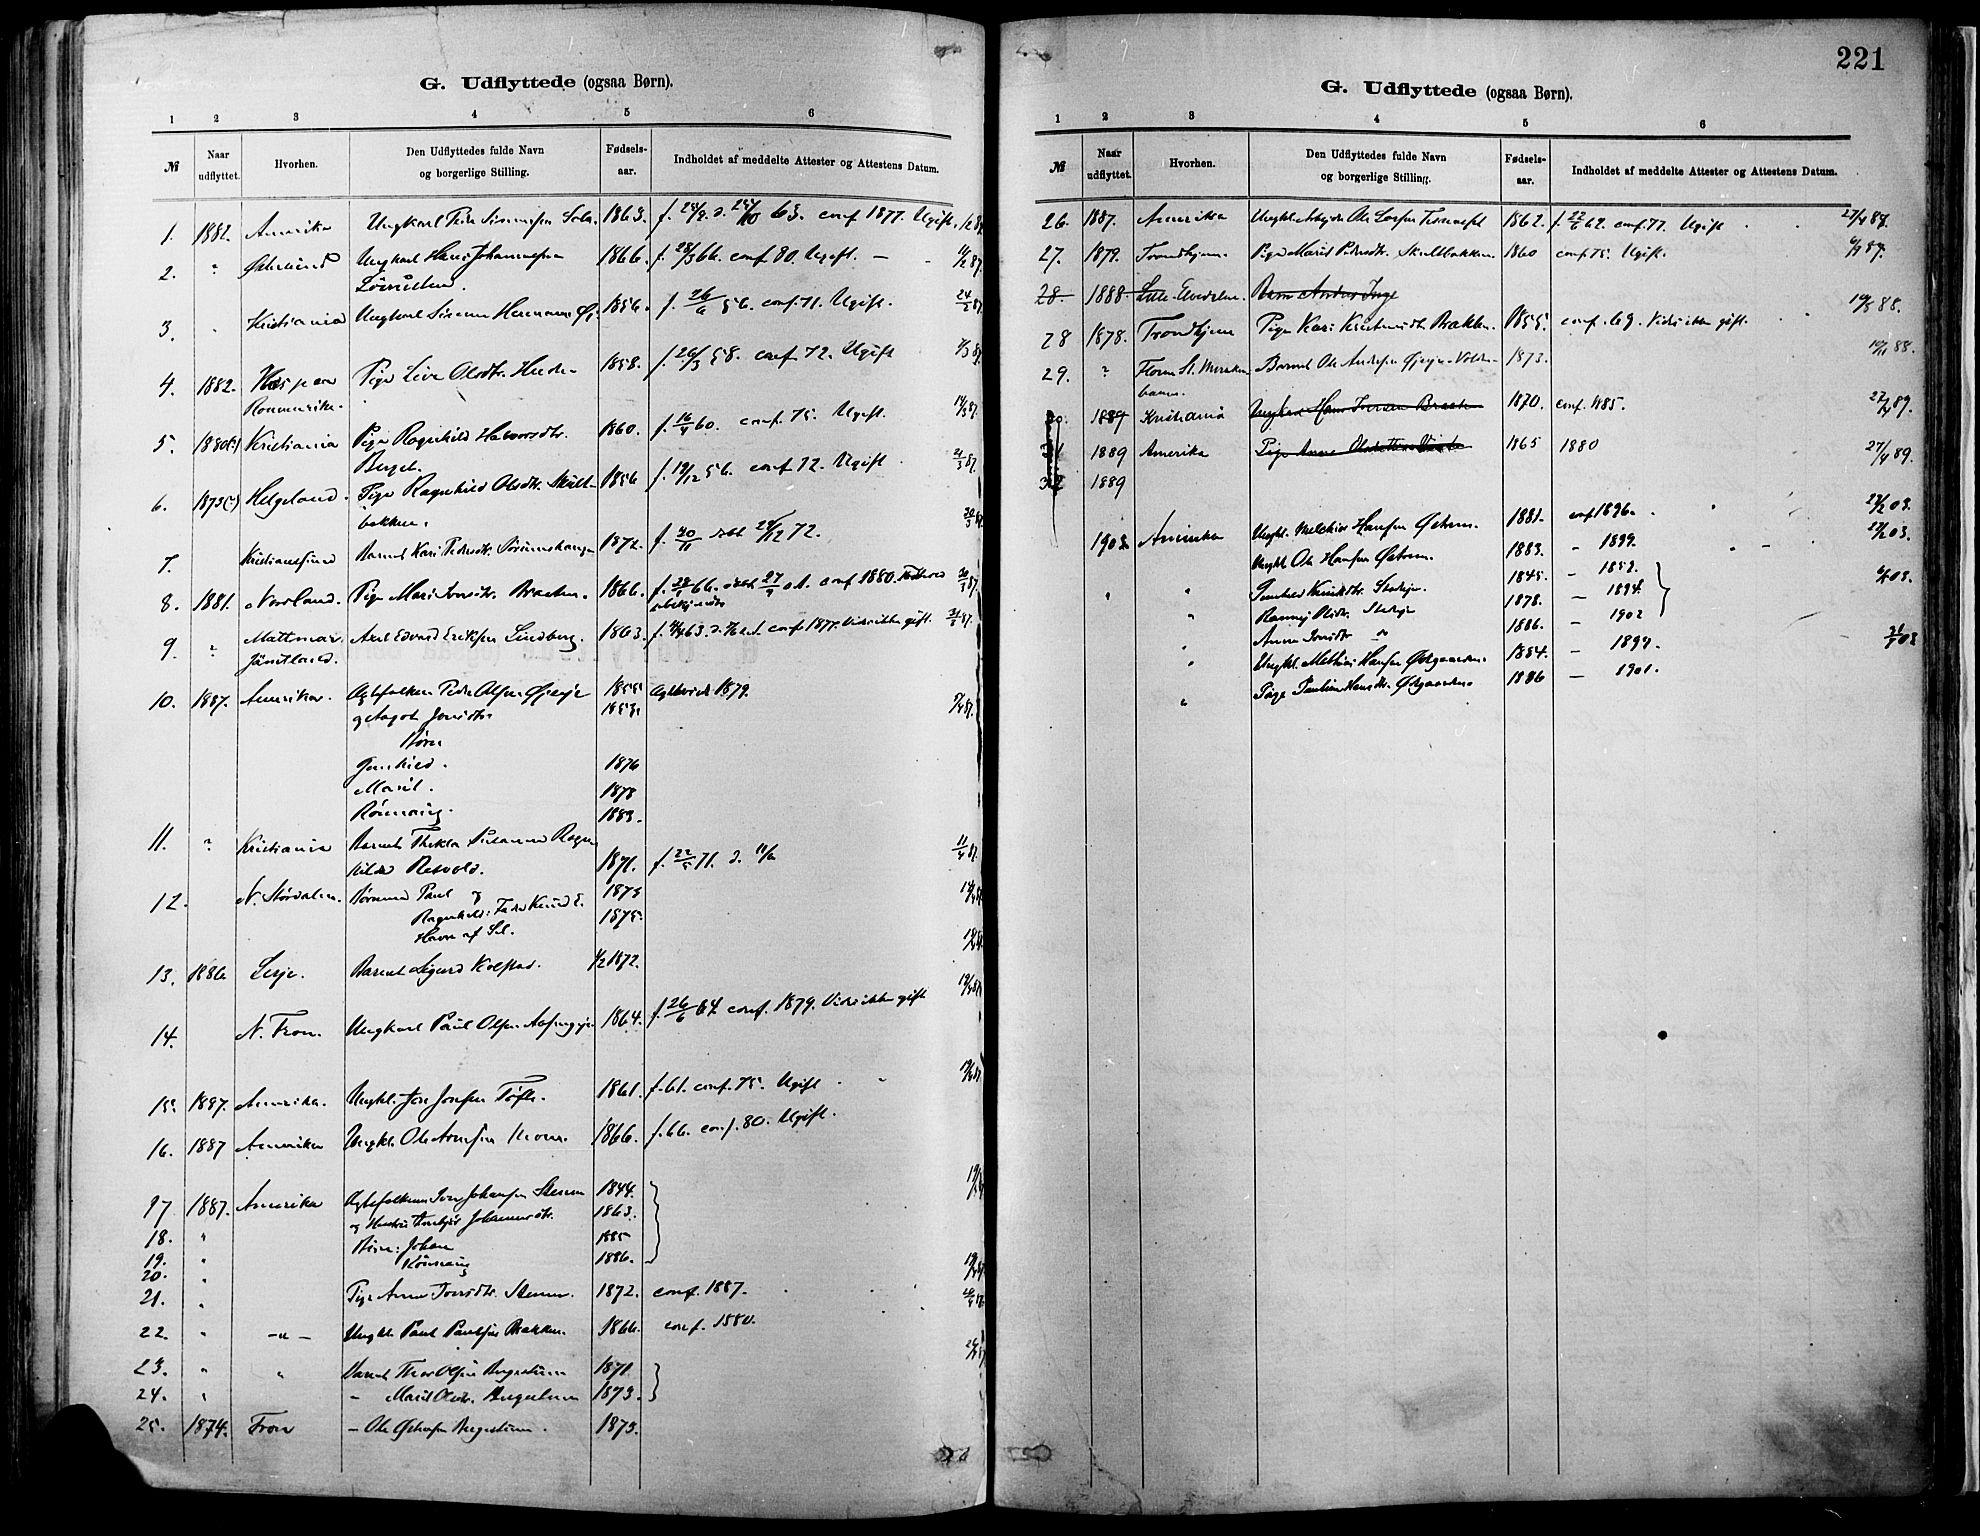 SAH, Vågå prestekontor, Ministerialbok nr. 9, 1886-1904, s. 221